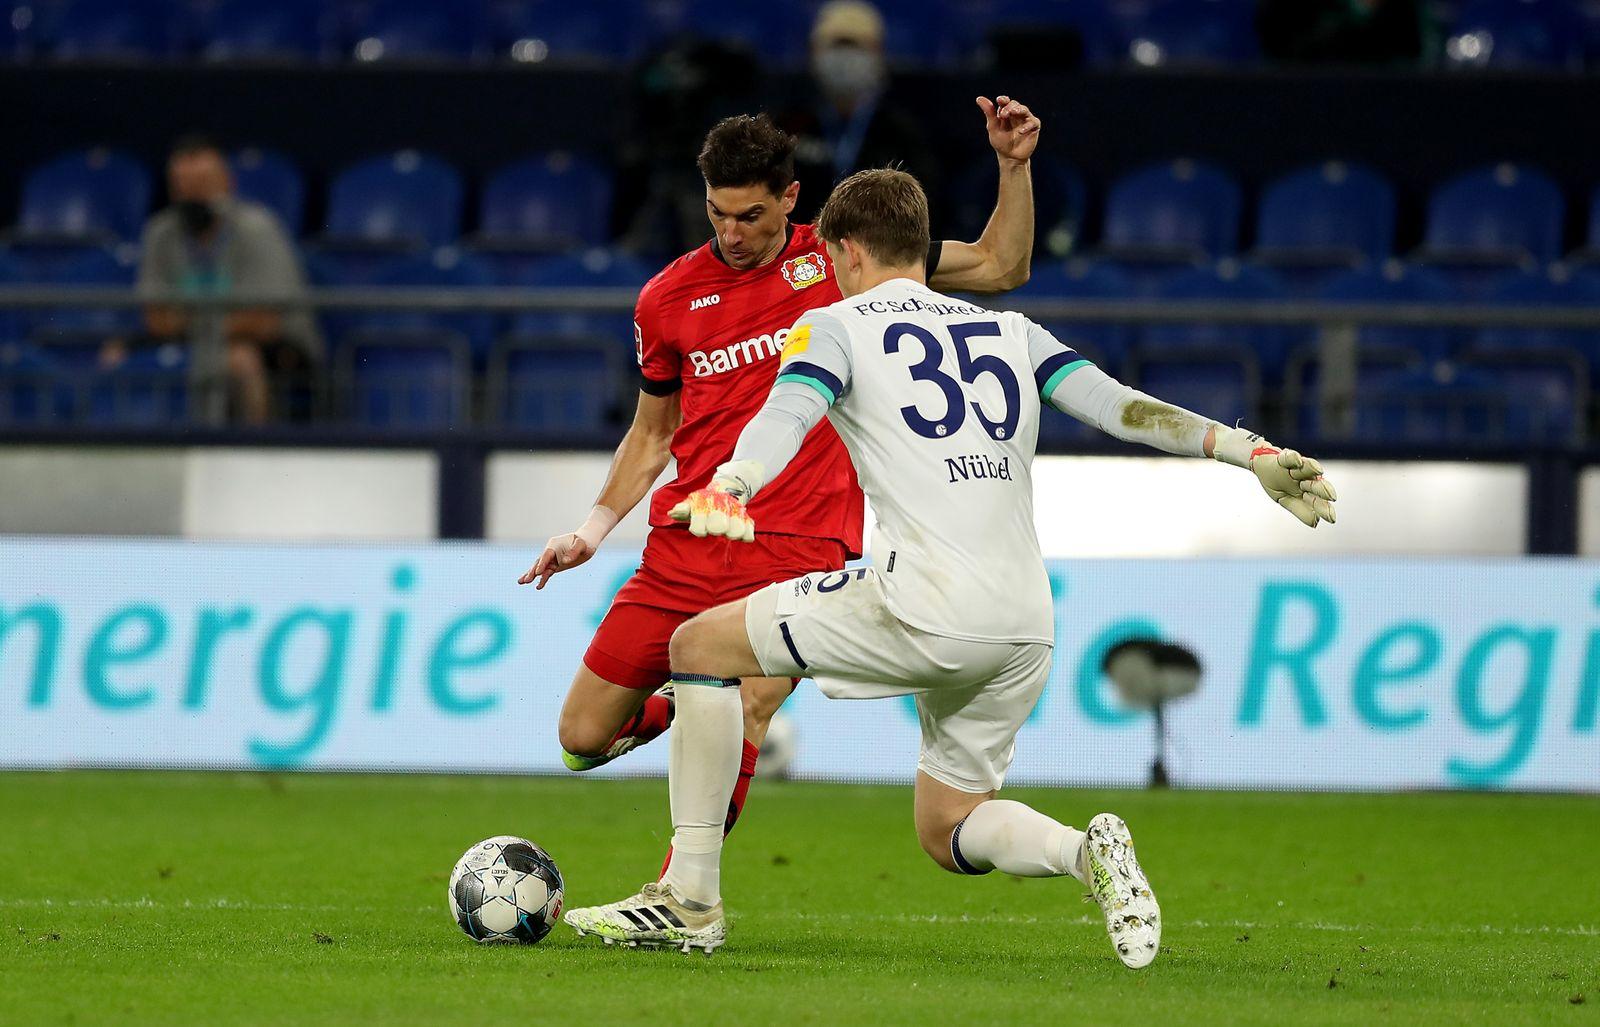 FC Schalke 04 vs Bayer 04 Leverkusen, Gelsenkirchen, Germany - 14 Jun 2020